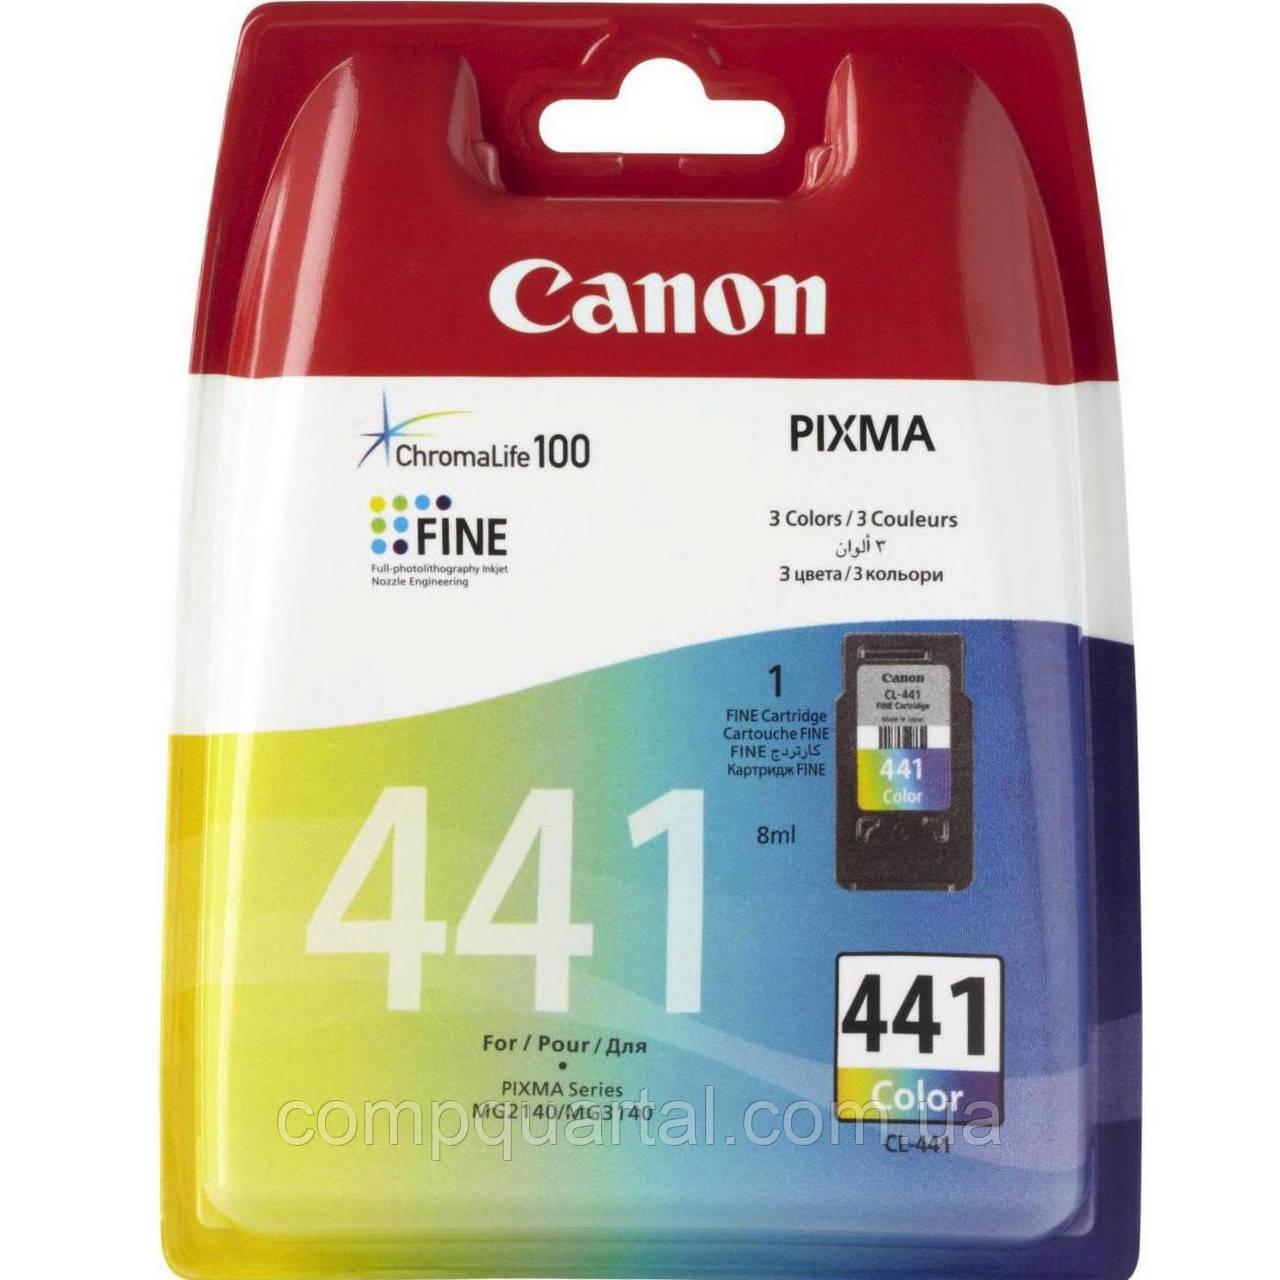 Картридж Canon CL-441 Color (5221B001AA)